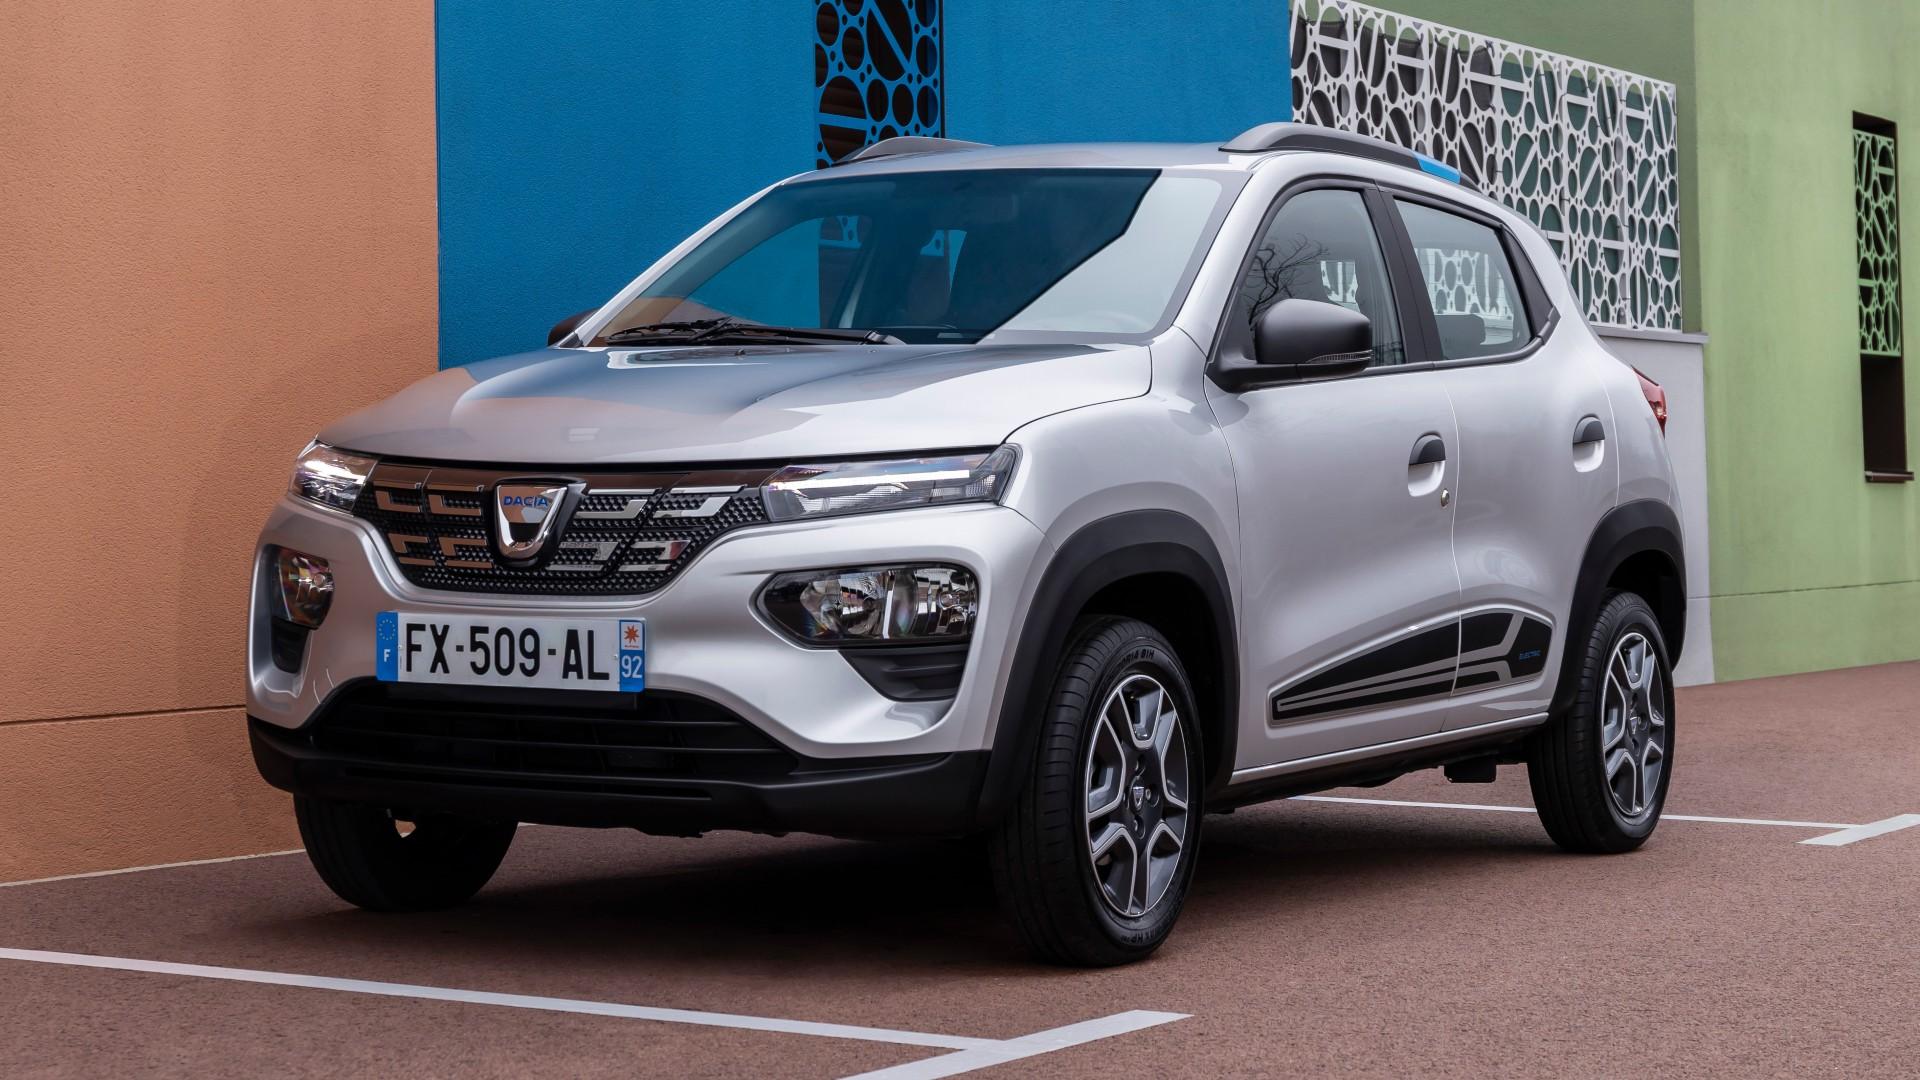 To πρώτο ηλεκτρικό της Dacia ποντάρει στην τιμή και όχι στις επιδόσεις! [pics]